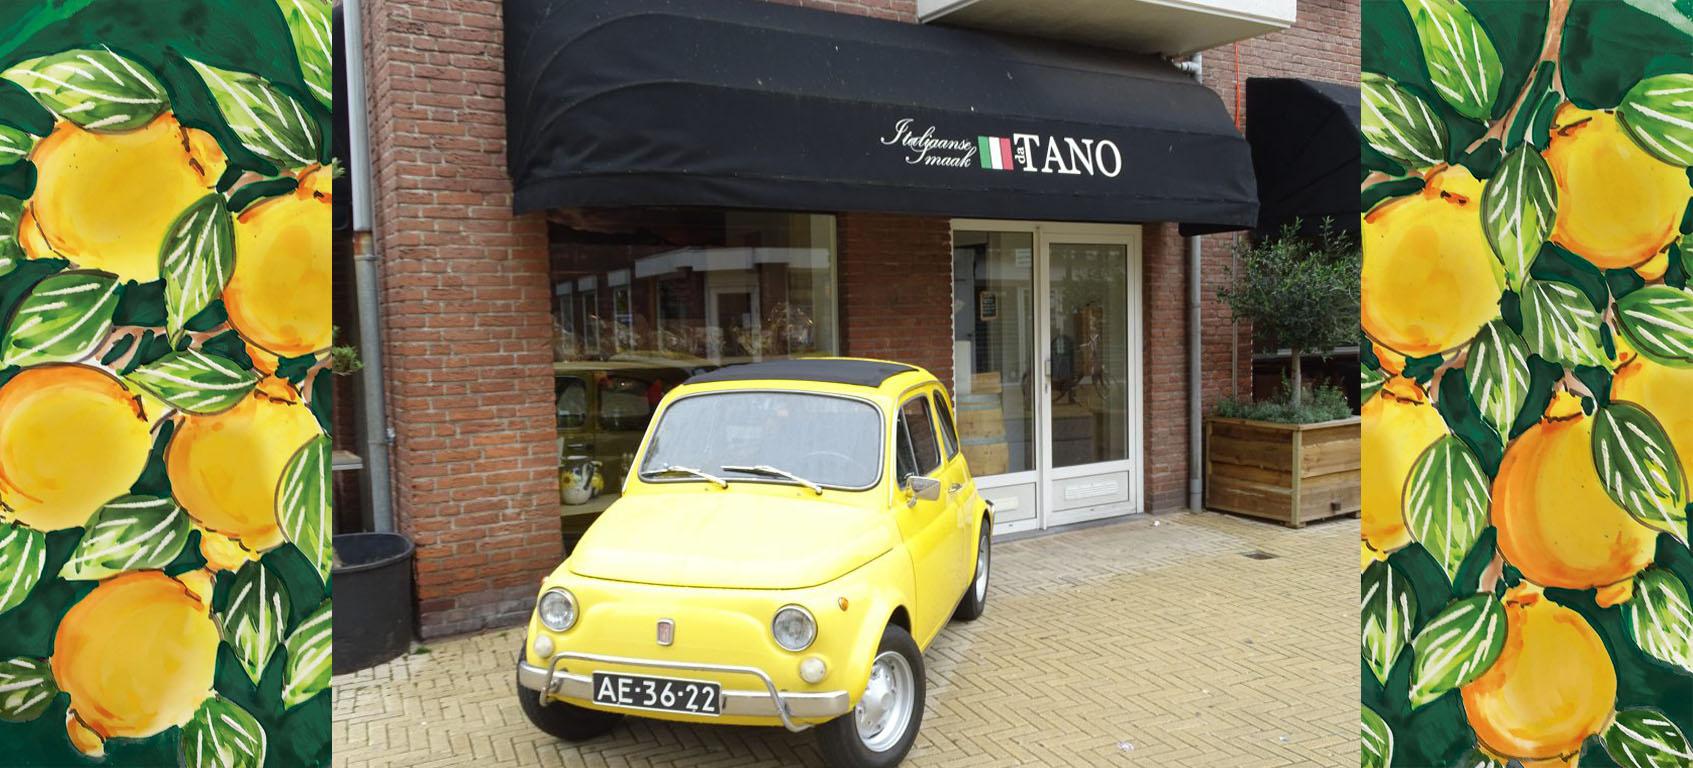 Da-Tano-Smakelijk-Eten-Lunch-Diner-Sassenheim-Restaurant